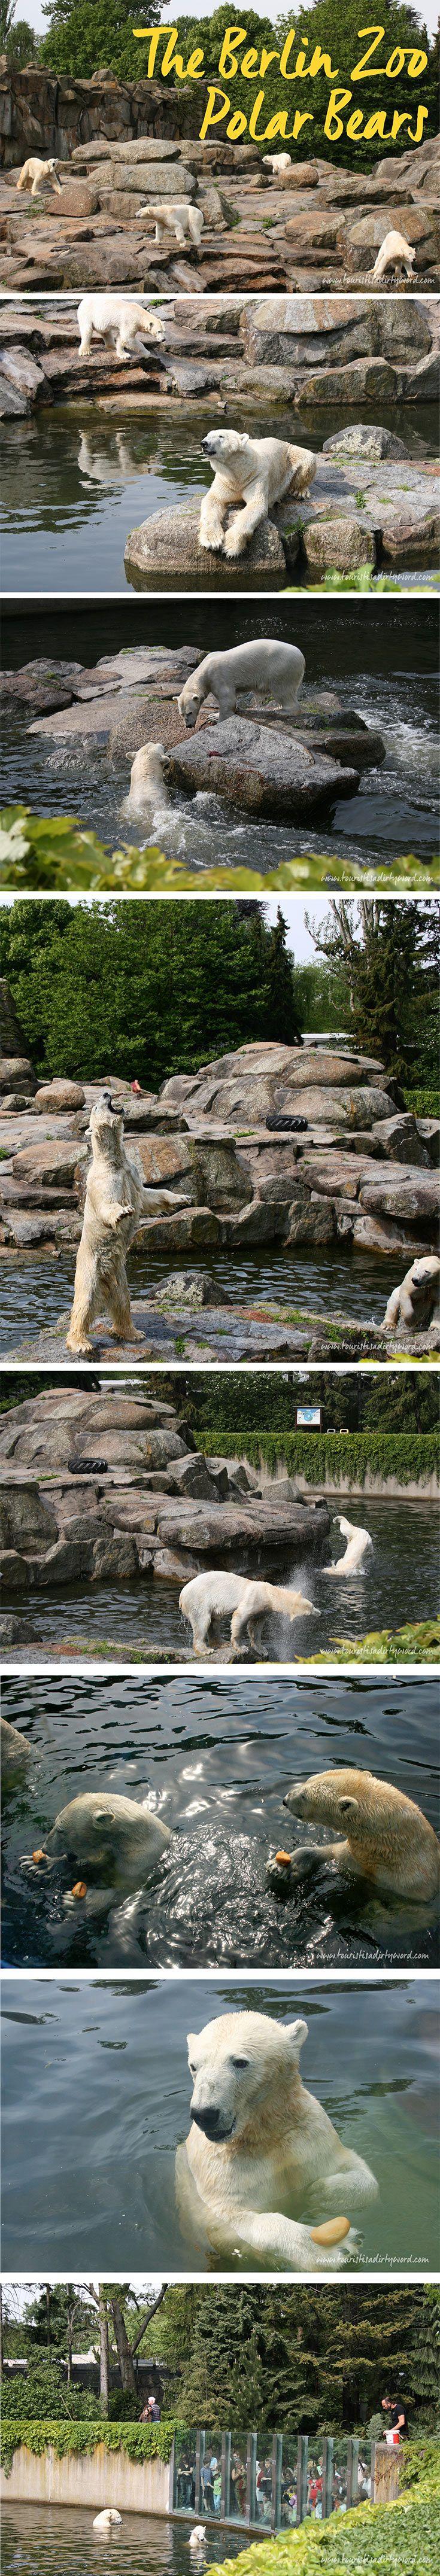 Polar Bear Feeding at the Berlin Zoo • Tourist is a Dirty Word Blog • Germany Travel